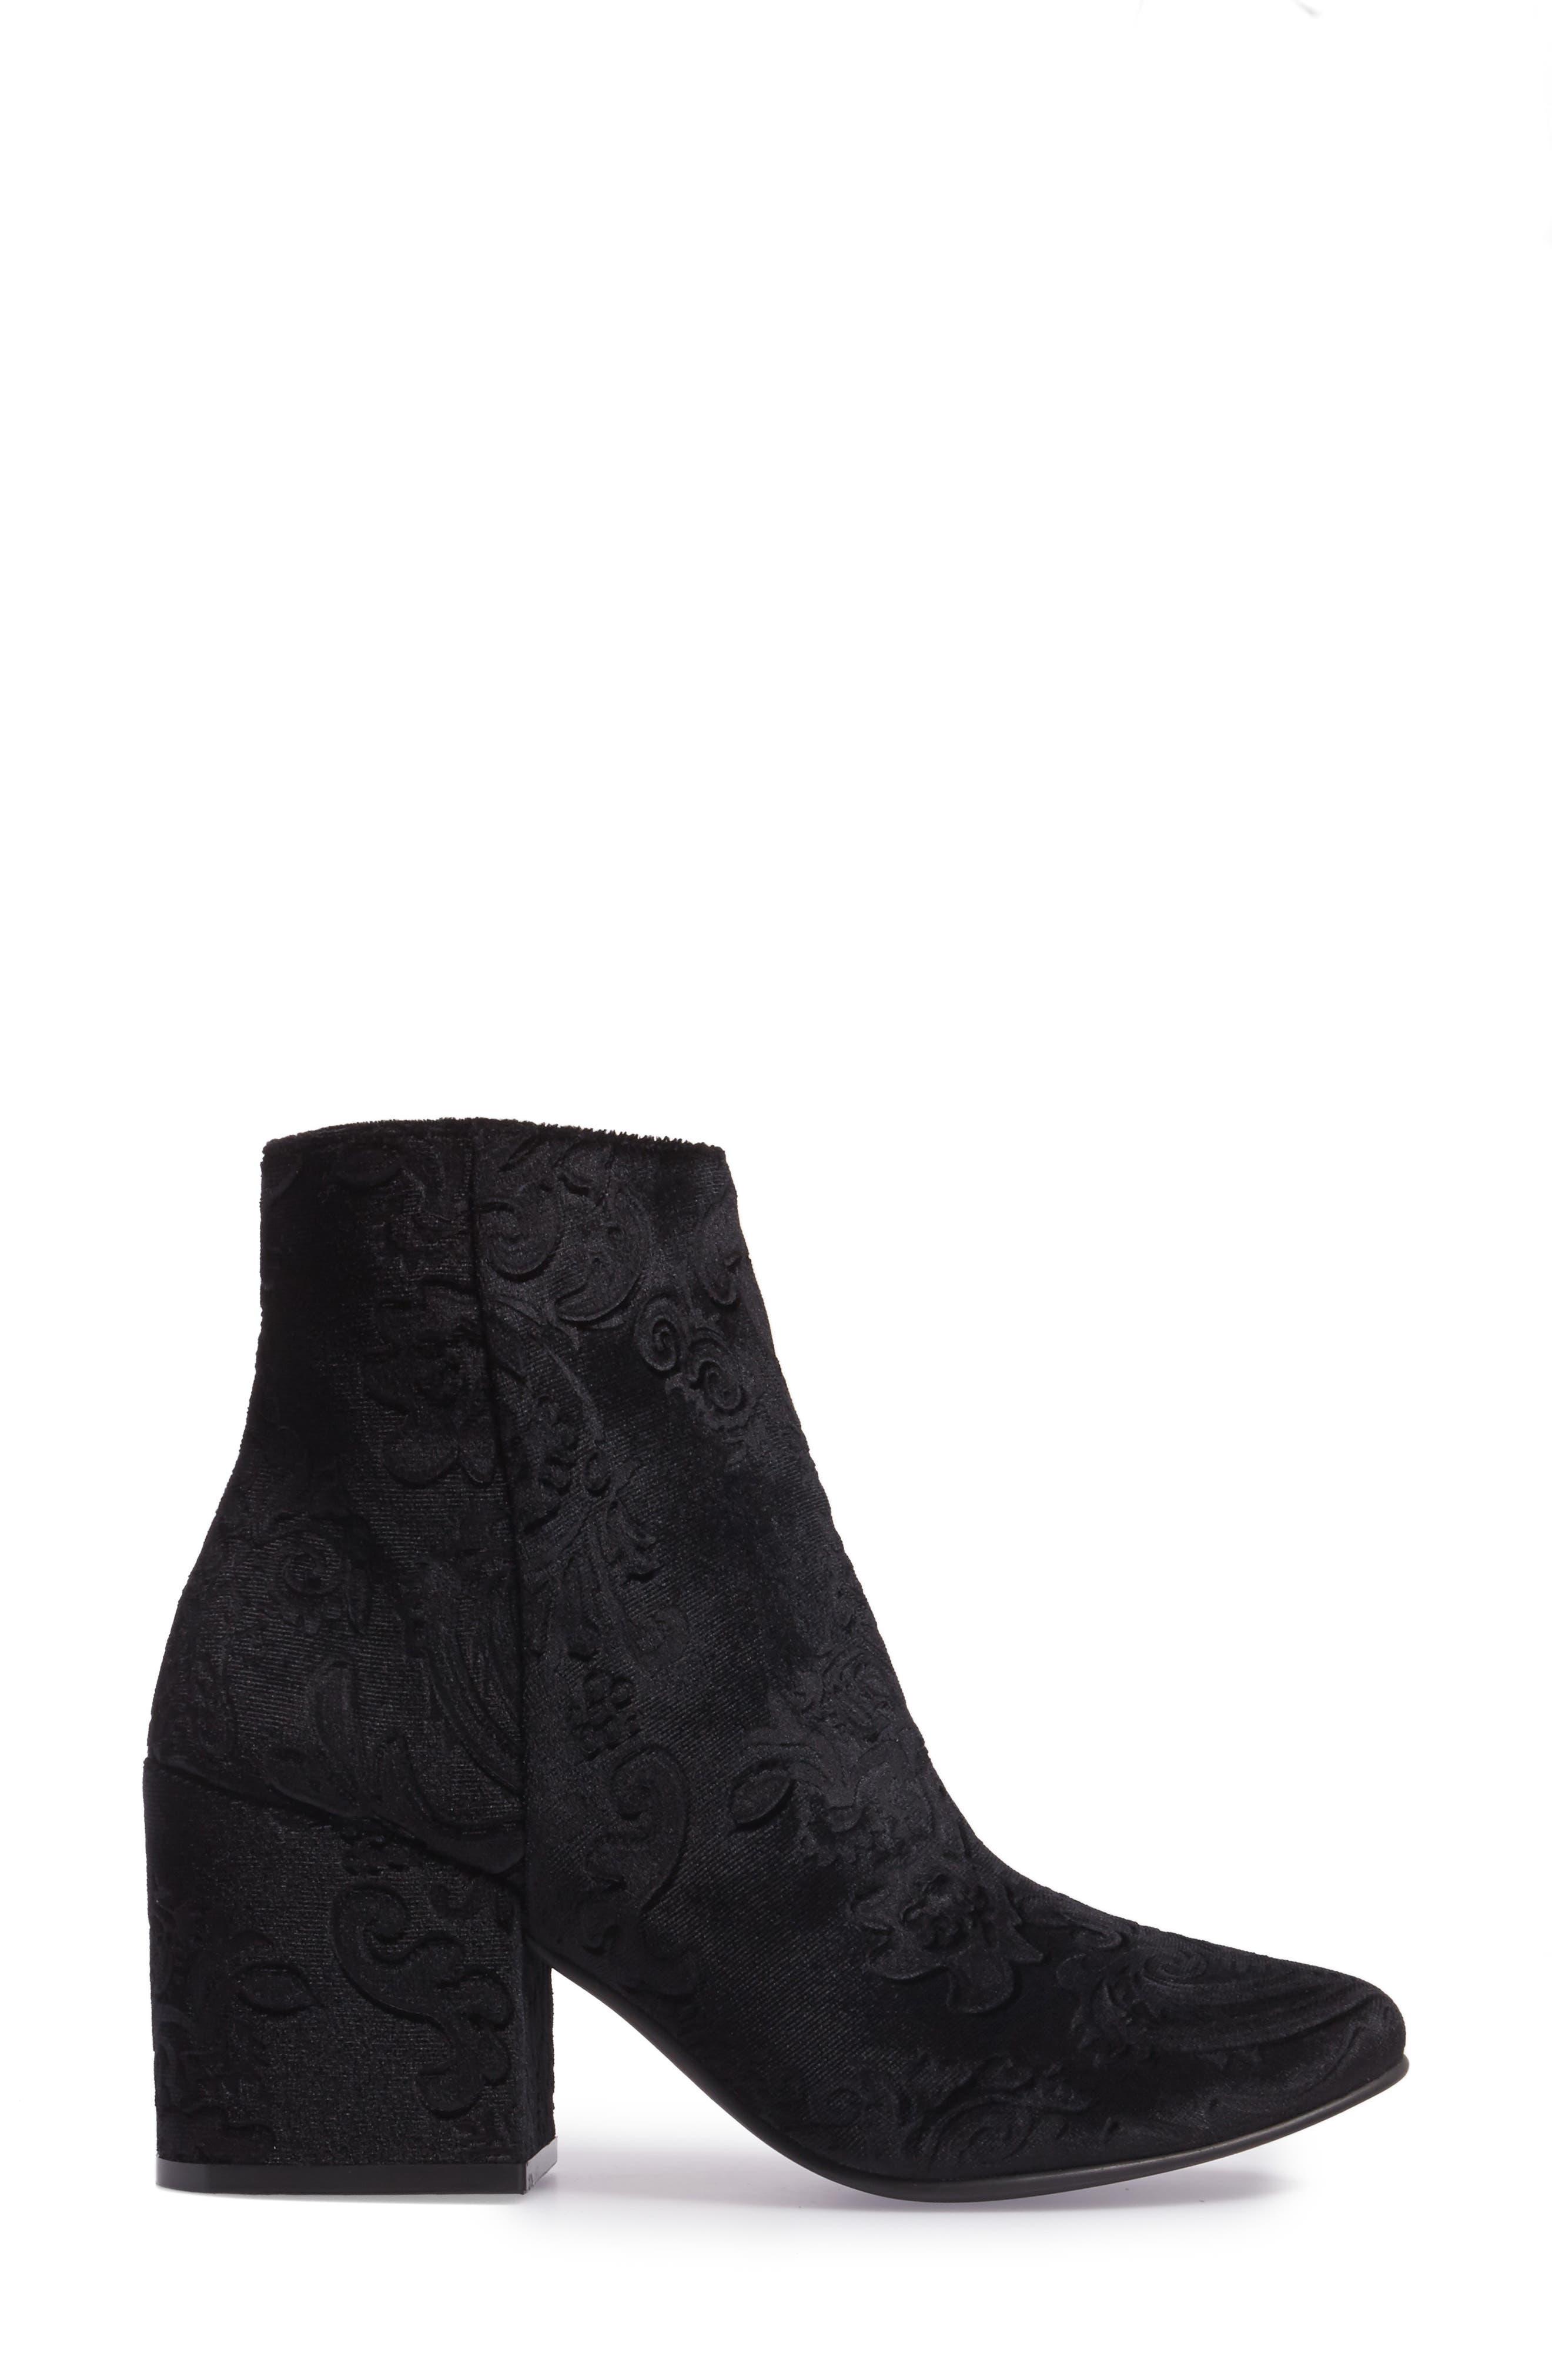 Marian Block Heel Bootie,                             Alternate thumbnail 3, color,                             Black Embossed Velvet